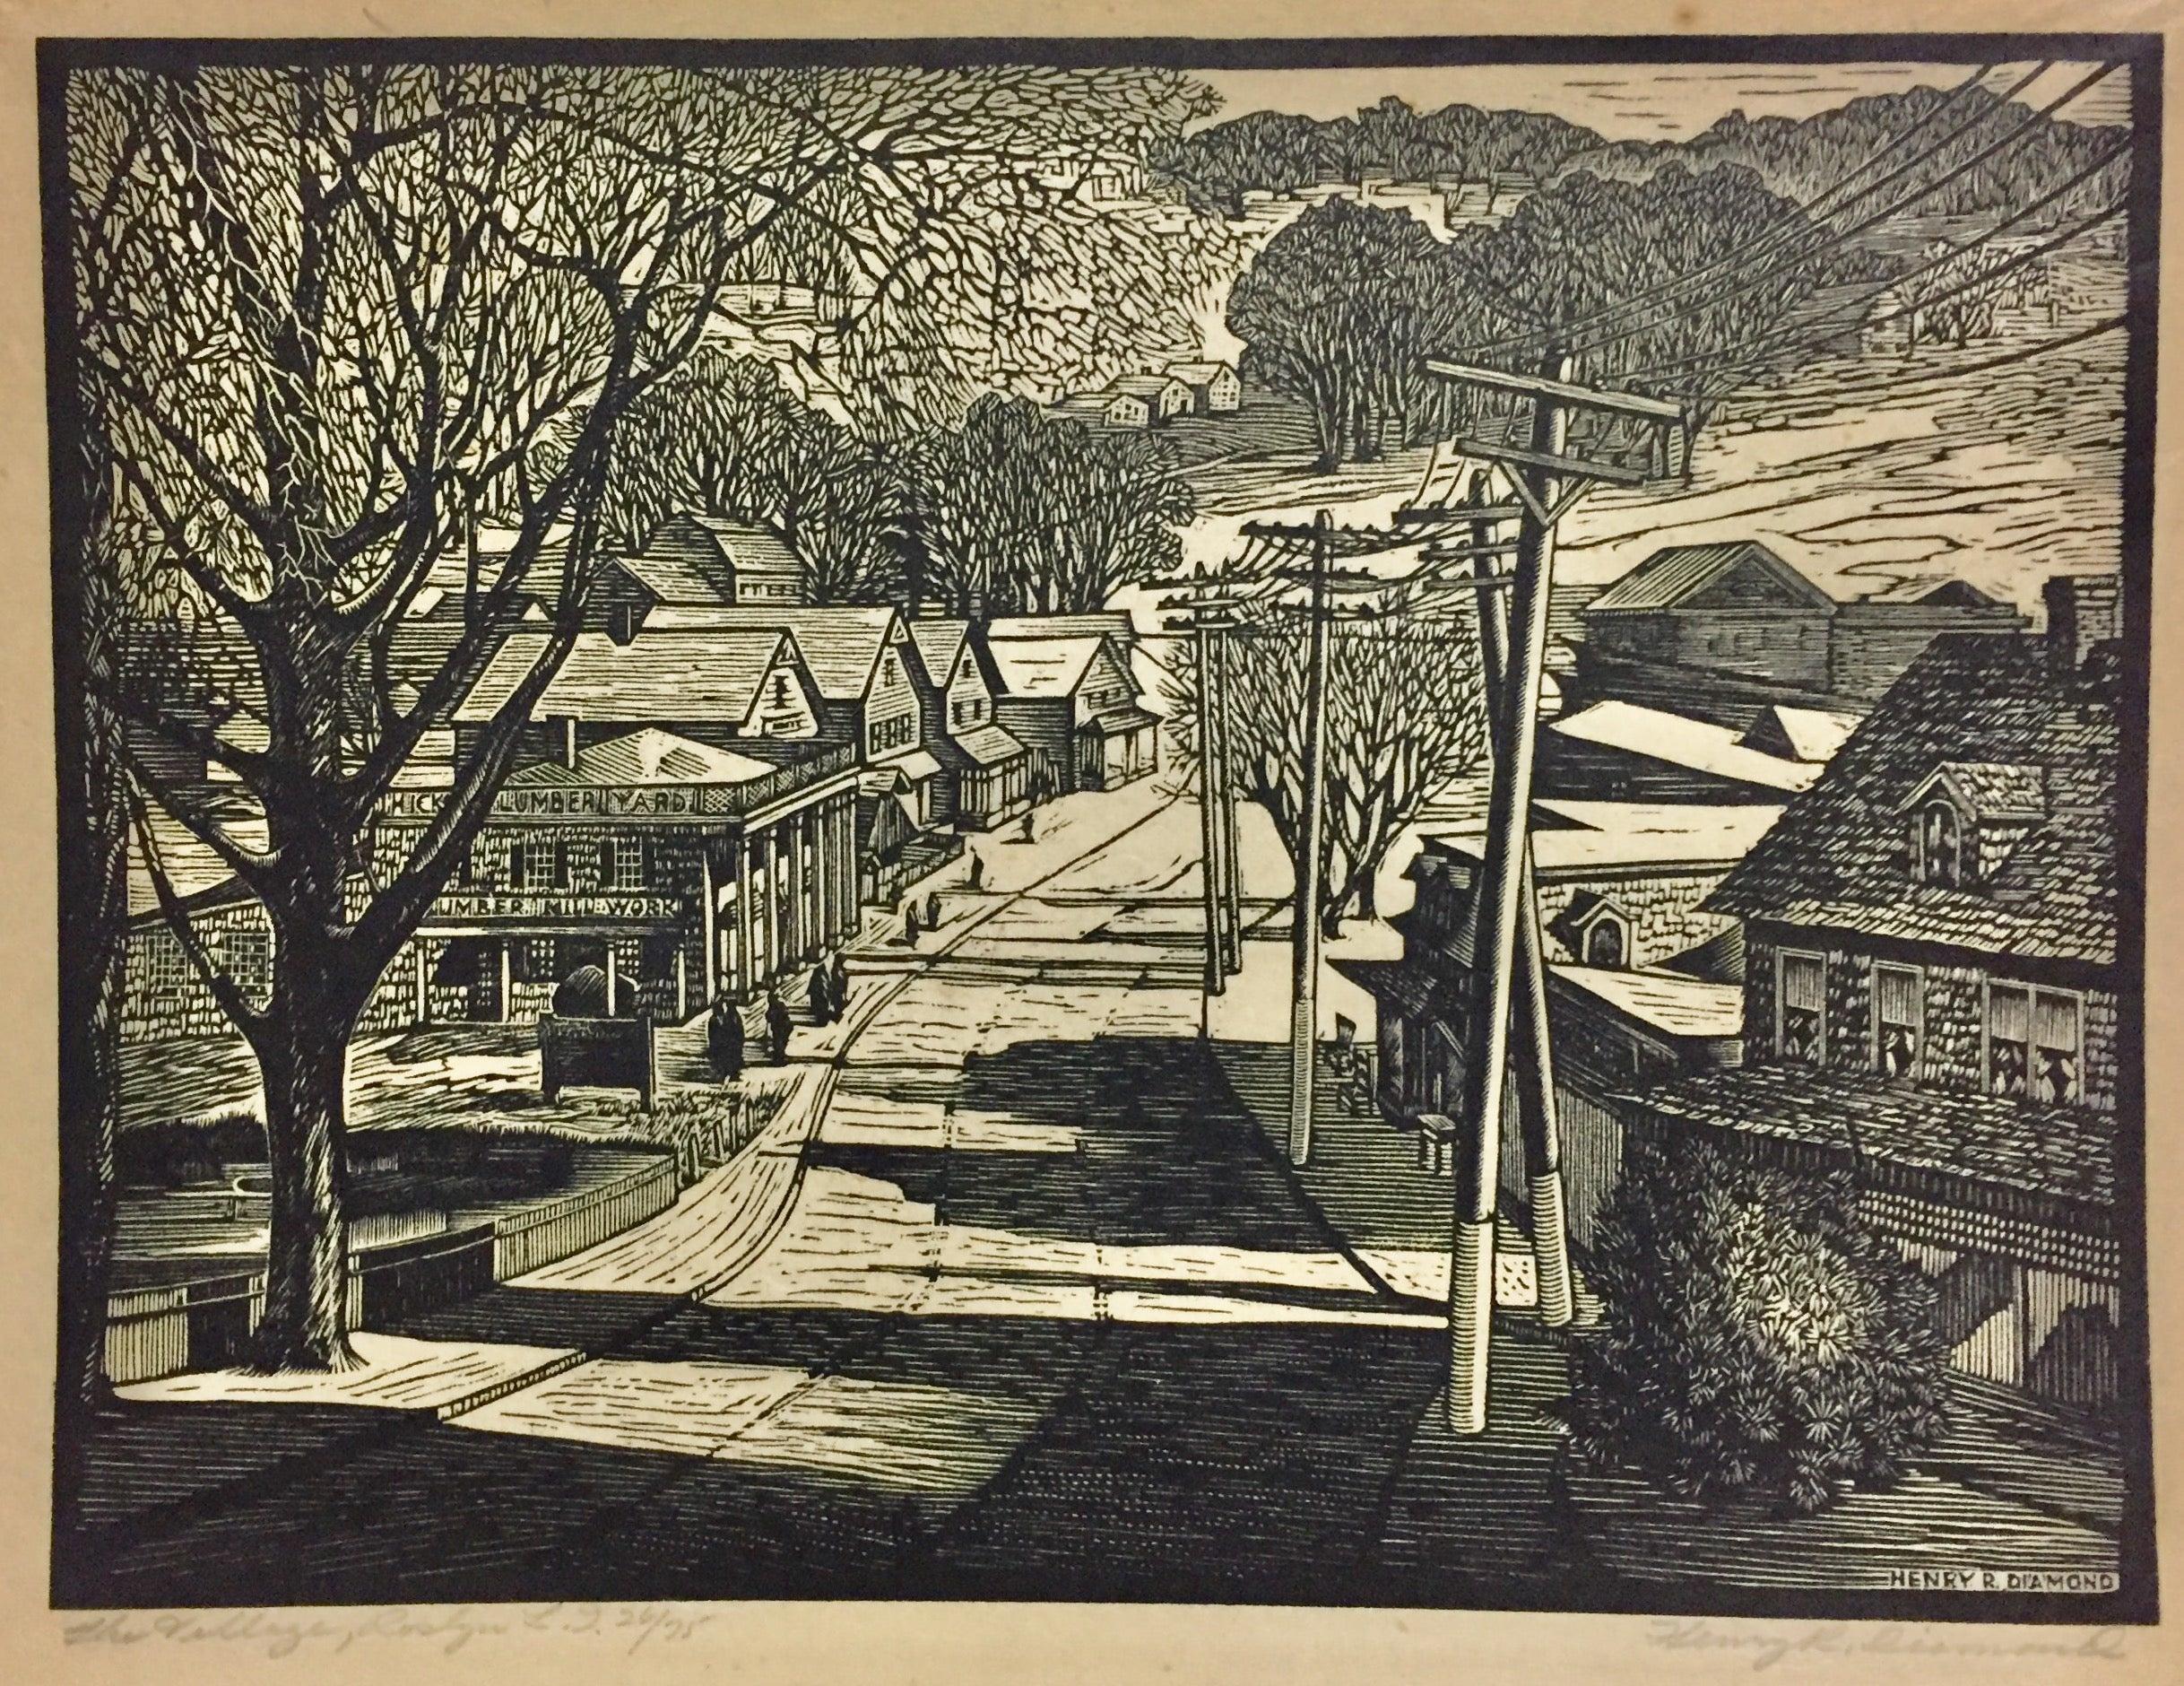 The Village, Roslyn, LI (New York)